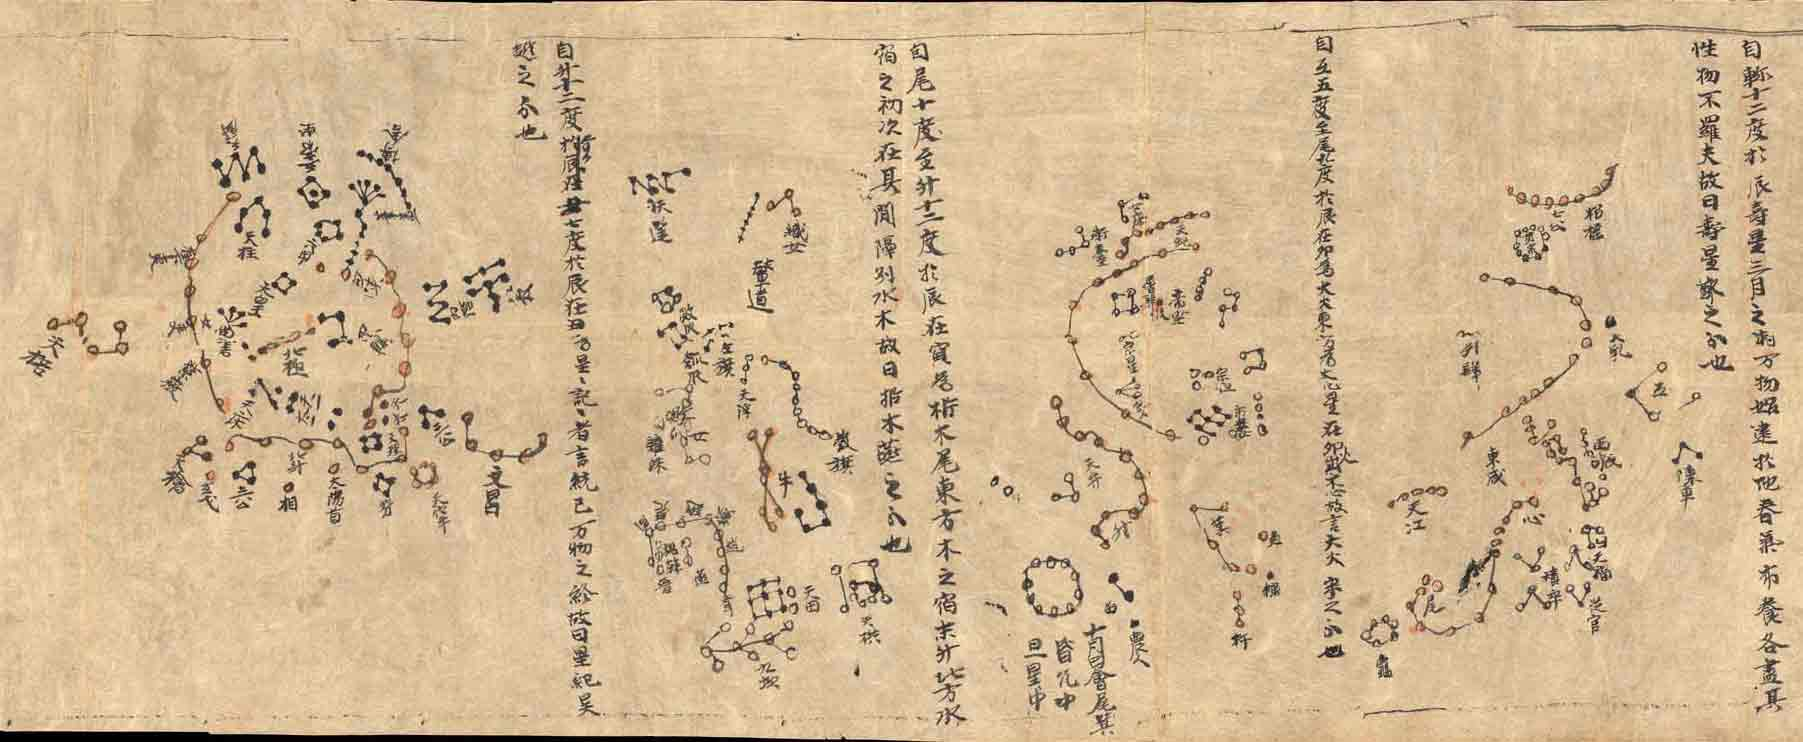 dunhuang star chart.jpg